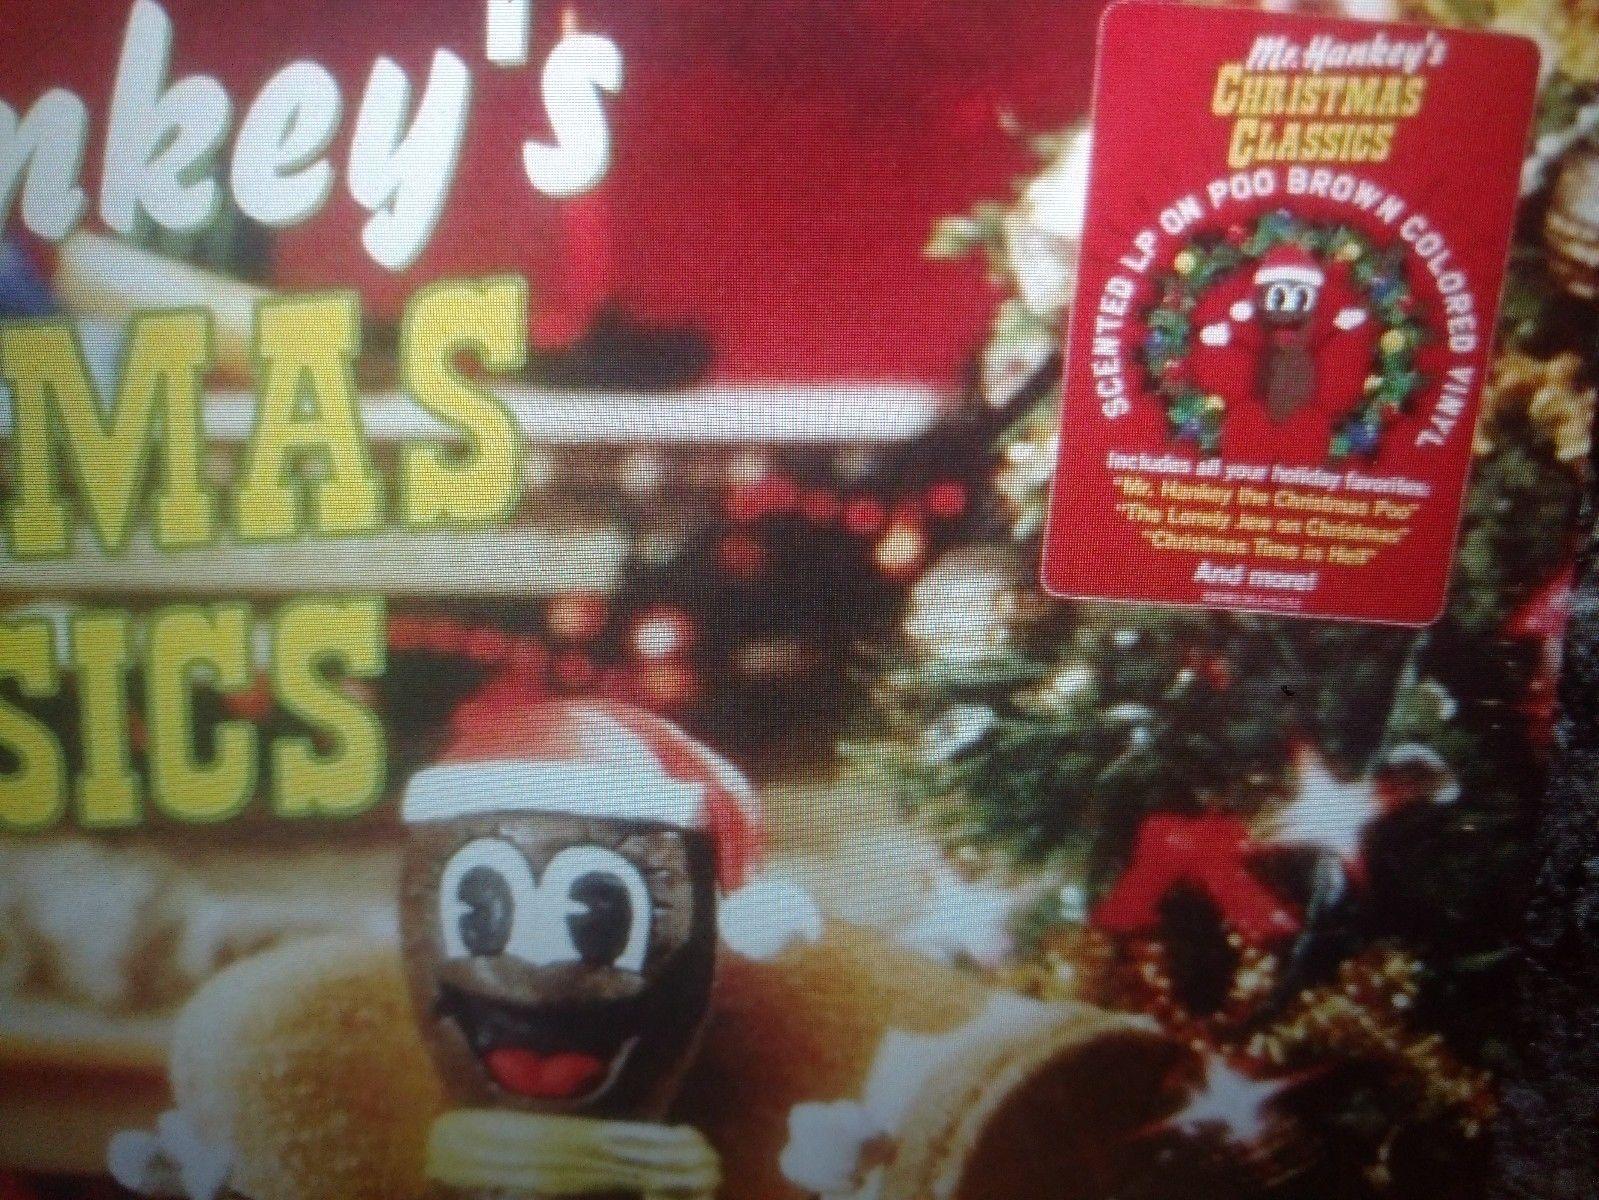 South Park Mr. Hankey\'s Christmas Classics Poo Vinyl RSD Black ...